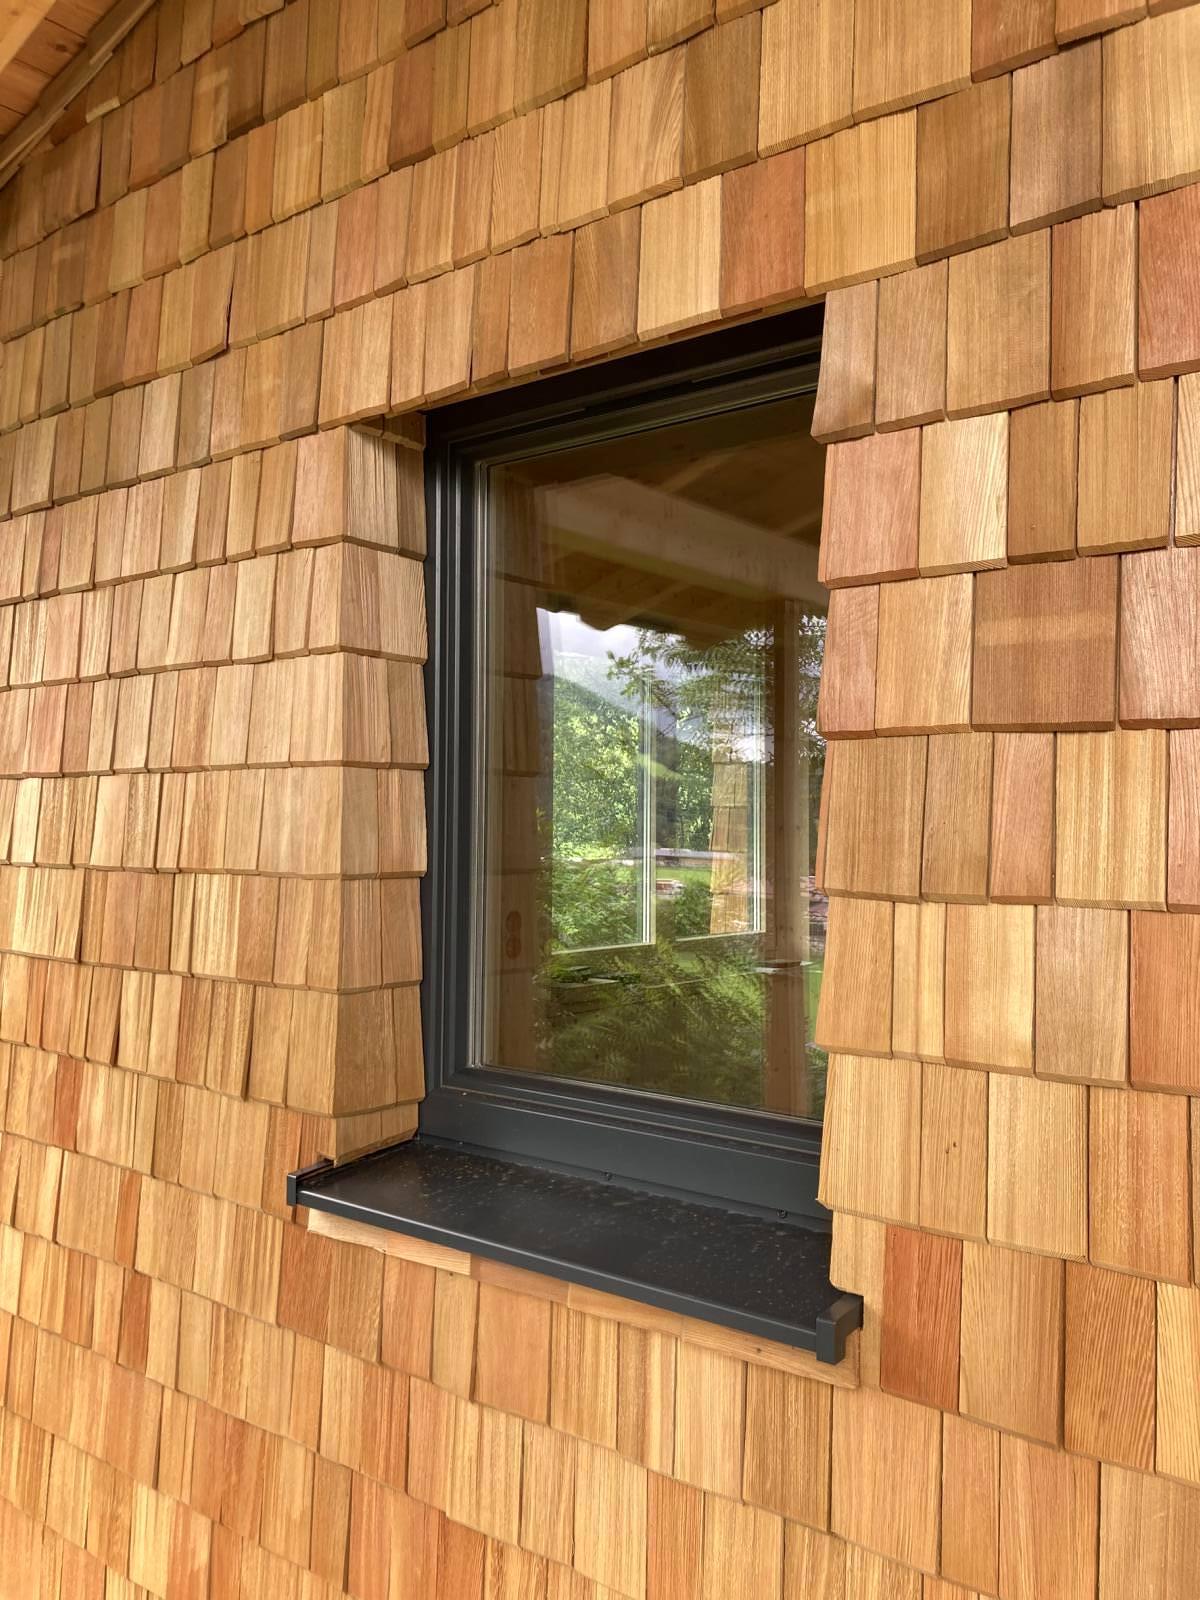 Thoma Holz100 Holz mit Lärchernfassade Fenster Ansicht